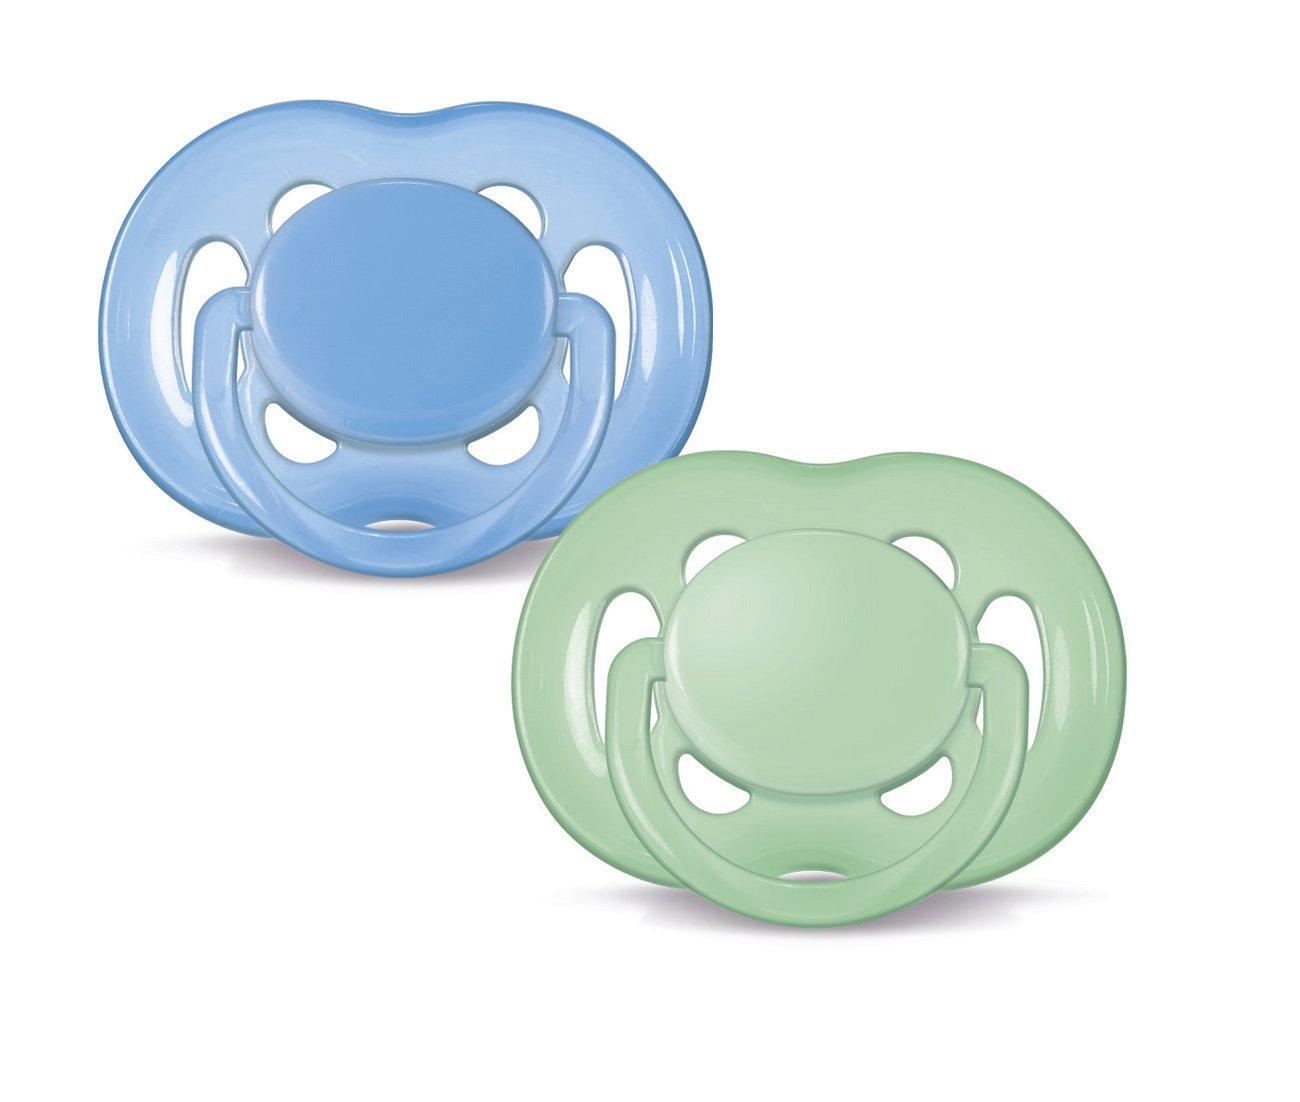 Amazon.com : Freeflow Chupete BPA, libre azul / verde, 6-18 ...